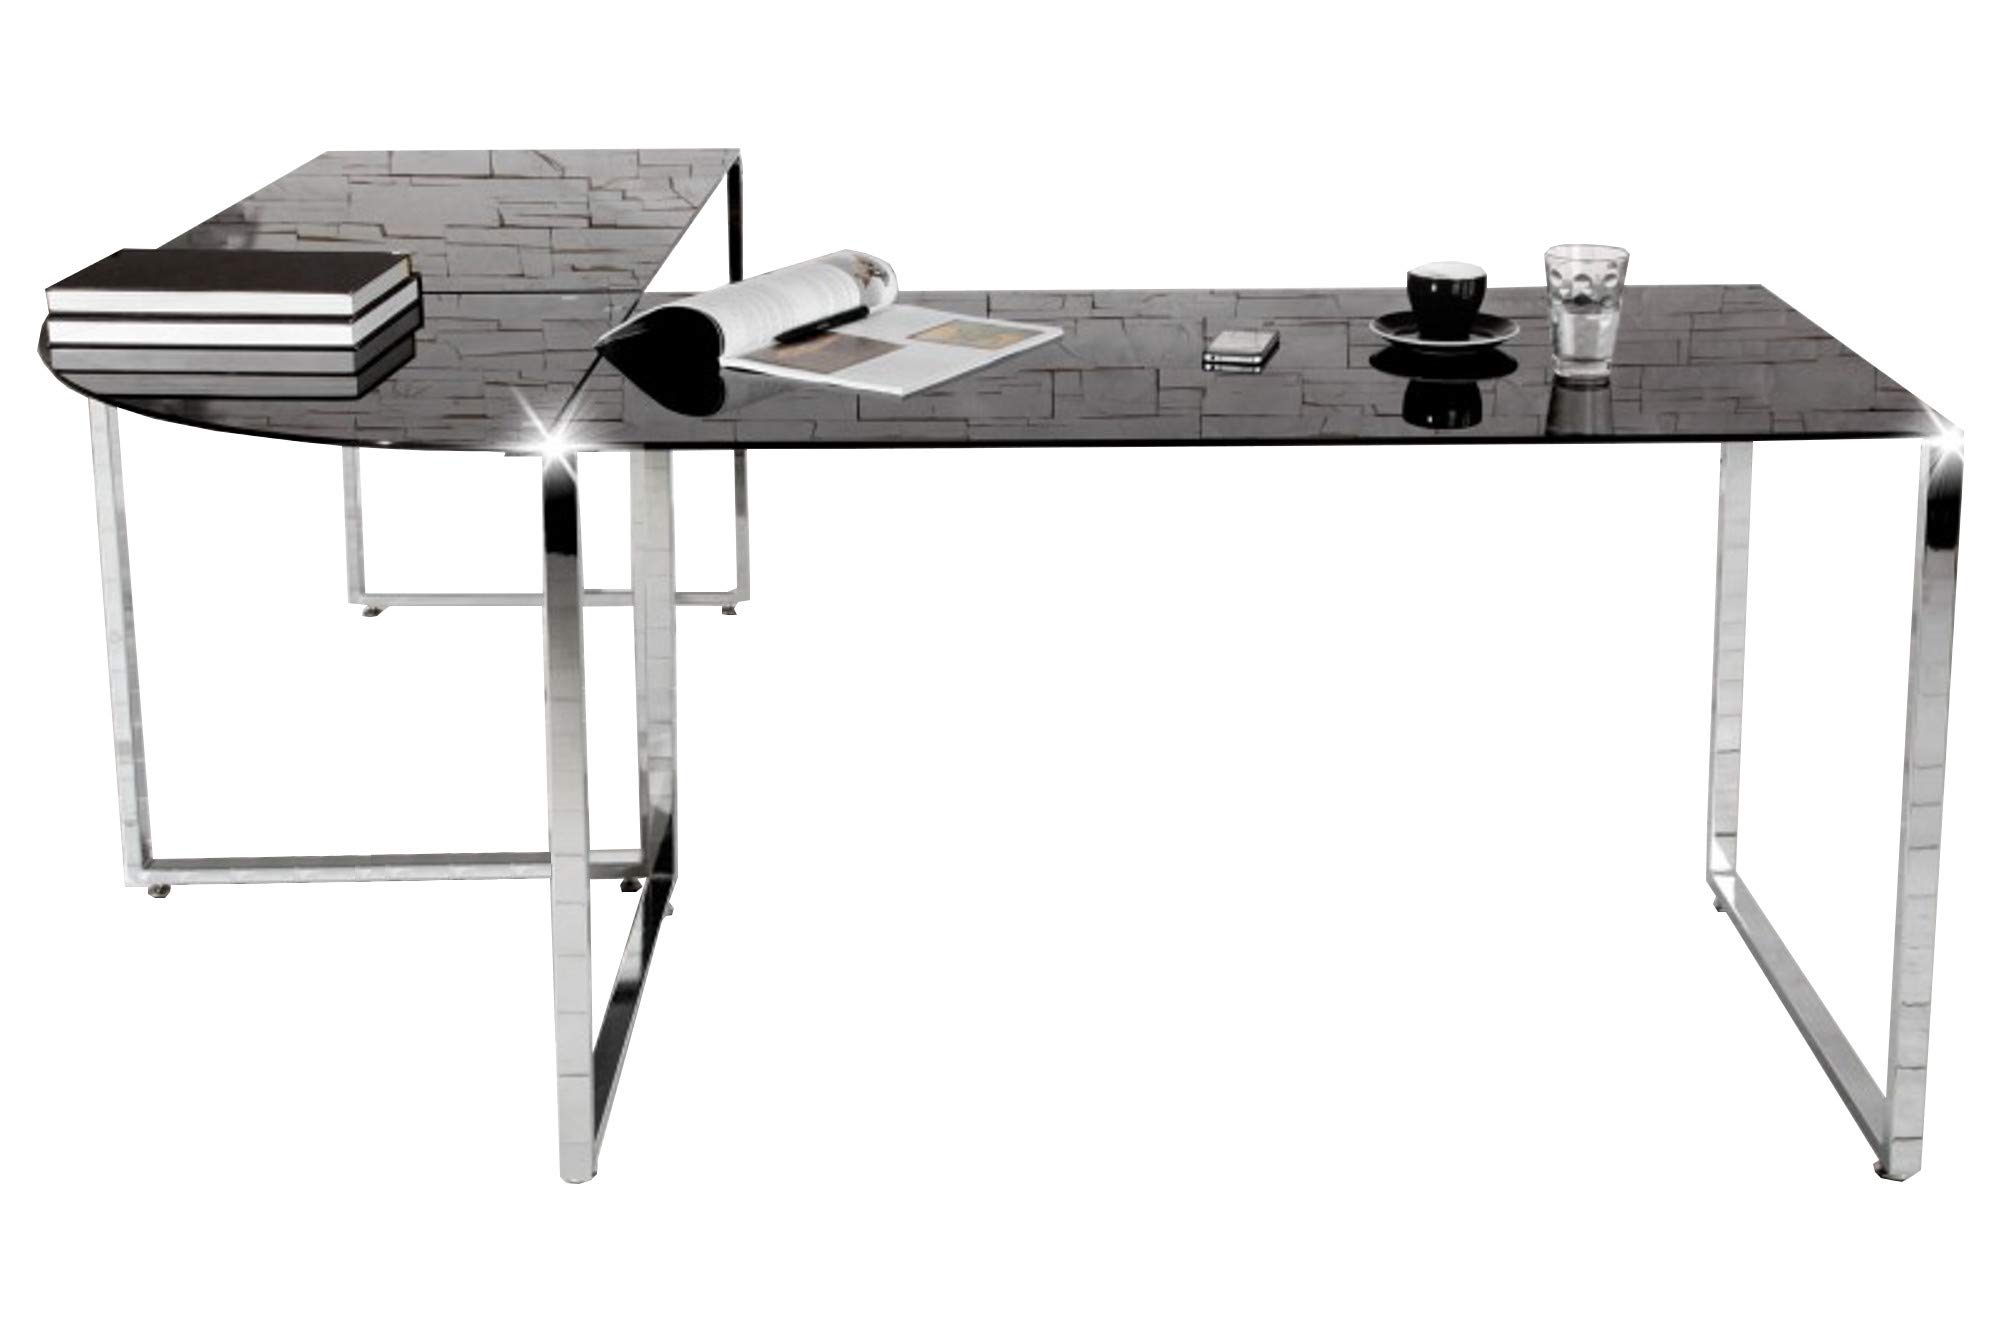 Glass Desk Office Ideas from m.media-amazon.com